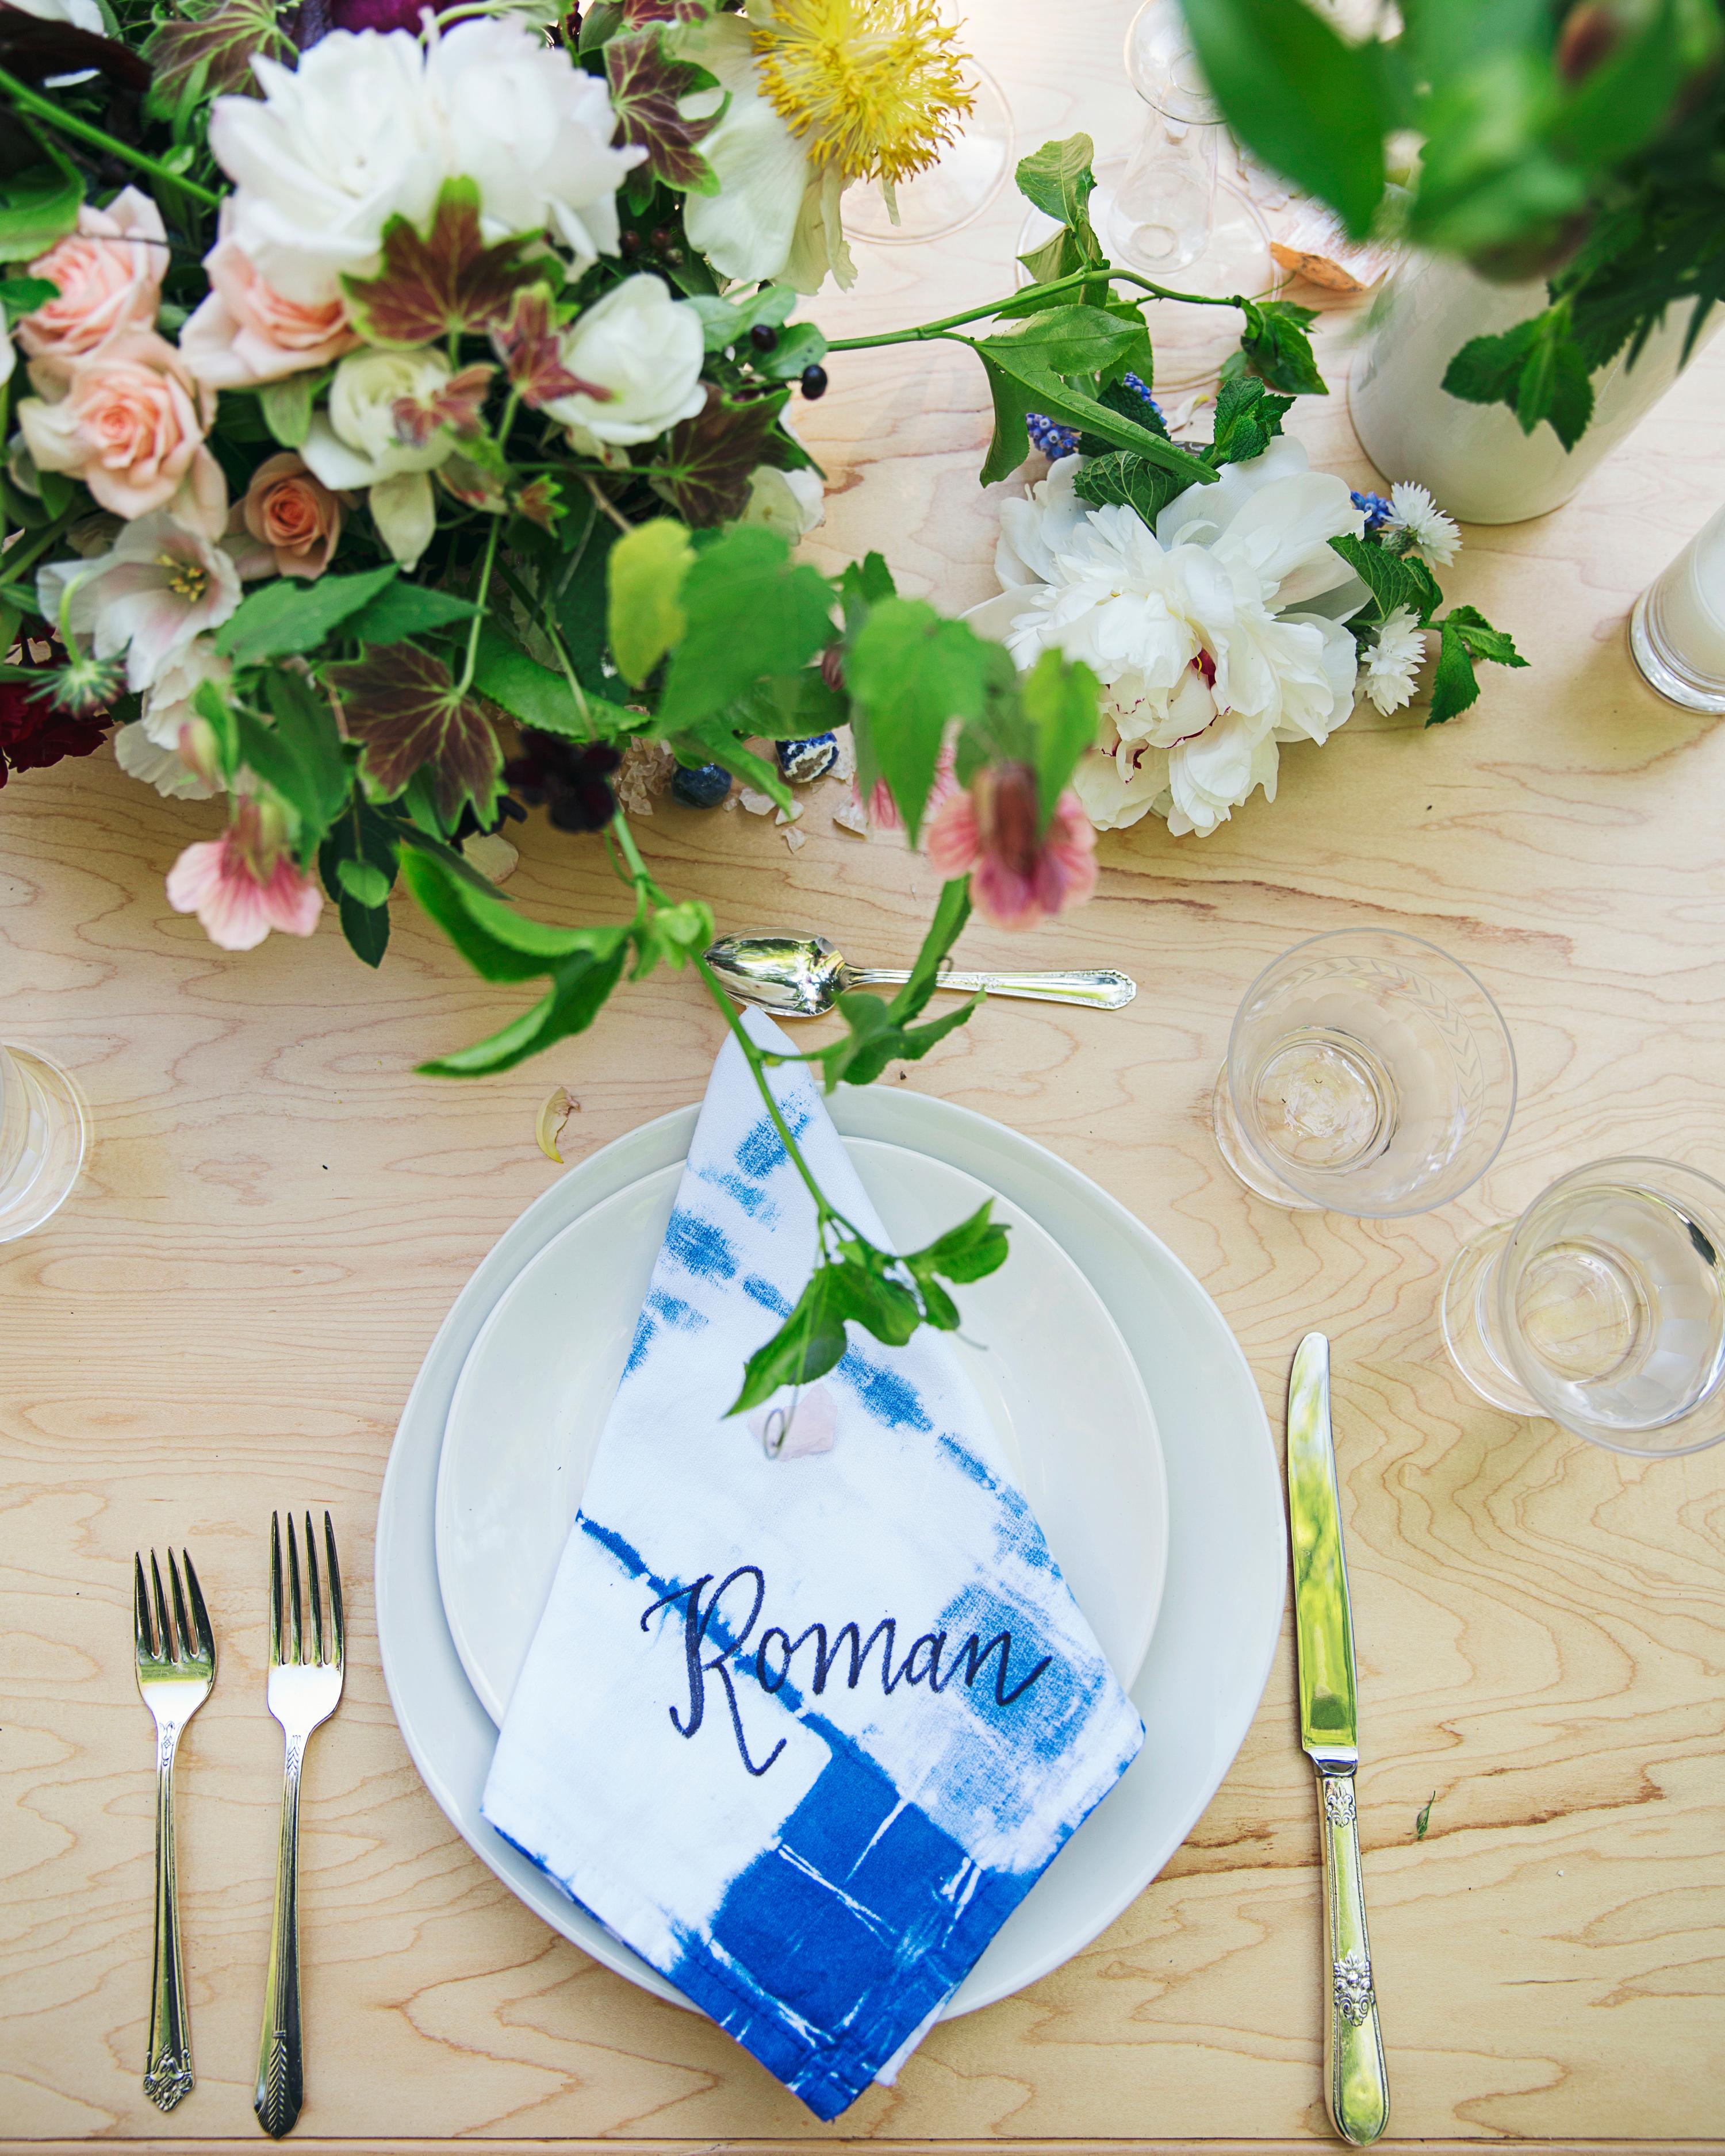 rosie-ambi-wedding-placesetting-4626-s112501-0116.jpg